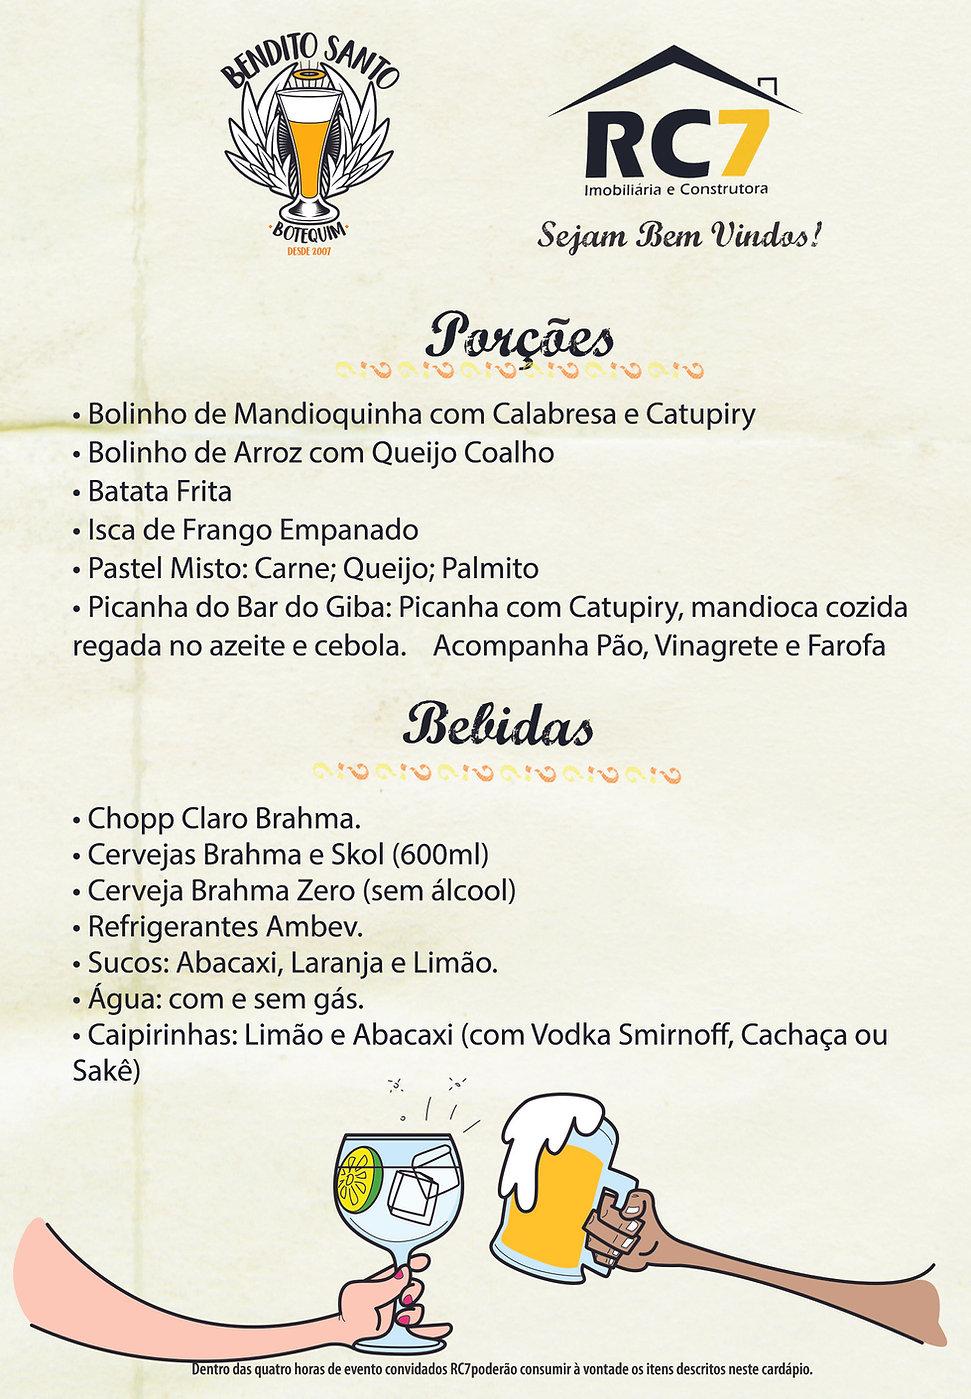 201212 - Cardápio-RC7.jpg